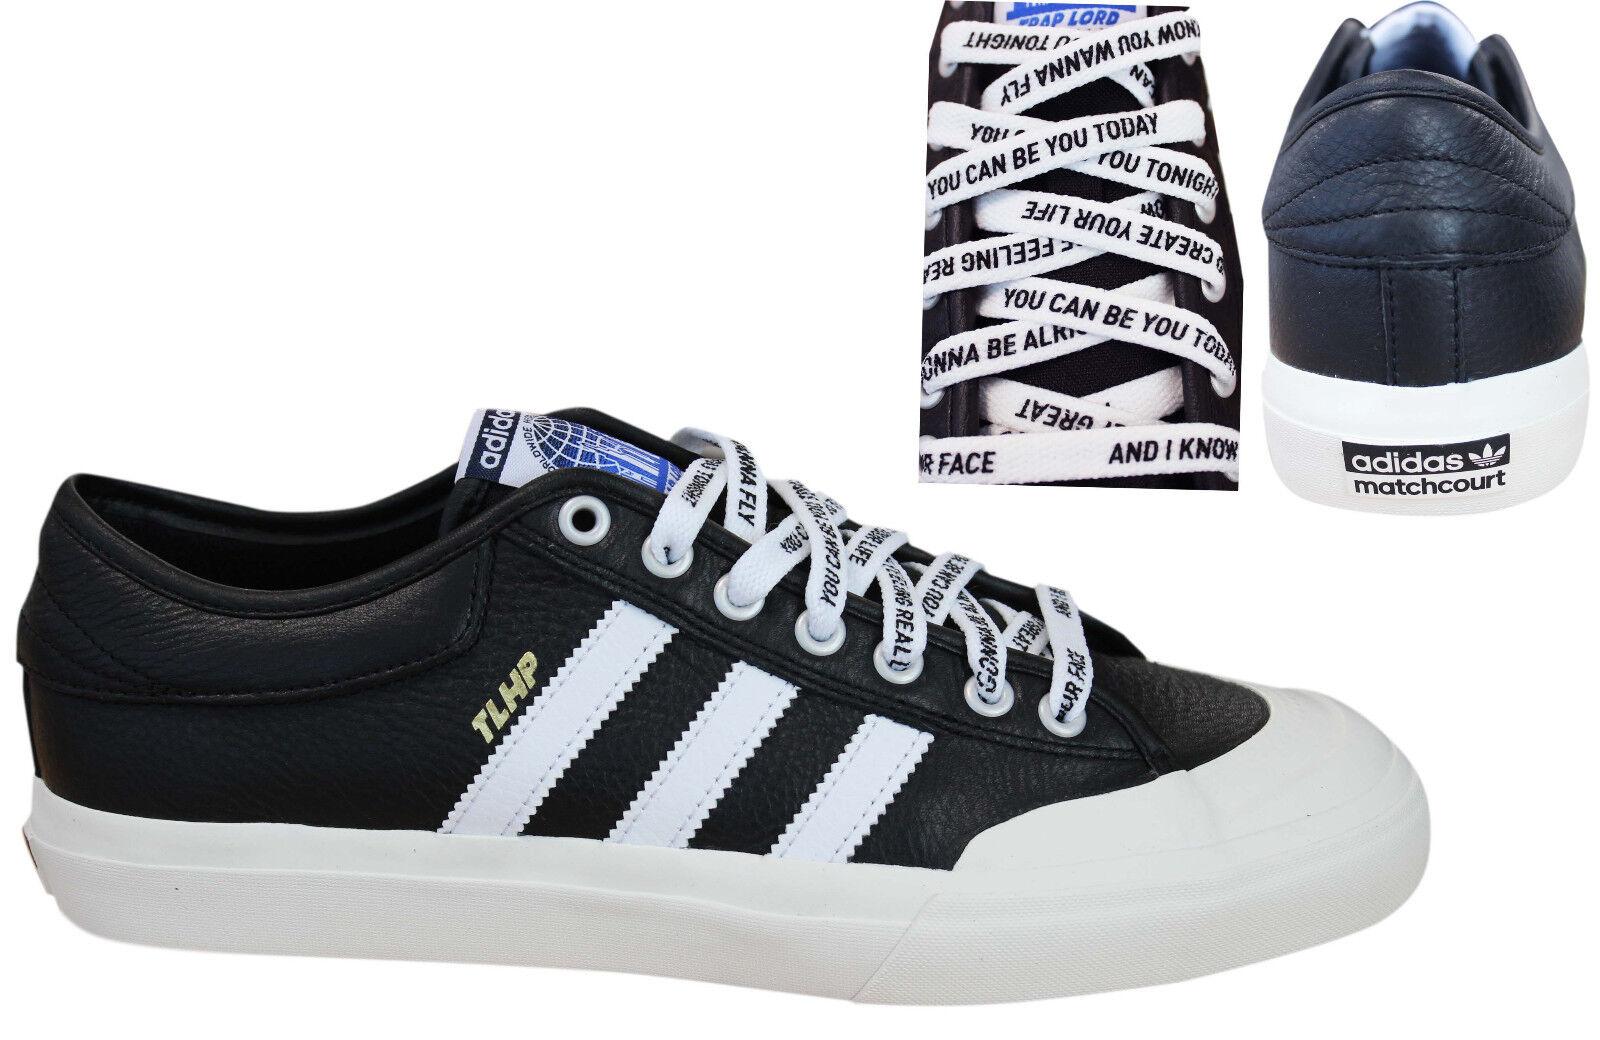 Adidas Originals matchcourt X Trap Lord Baskets Homme à Lacets Chaussures CG5614 Oppm 9